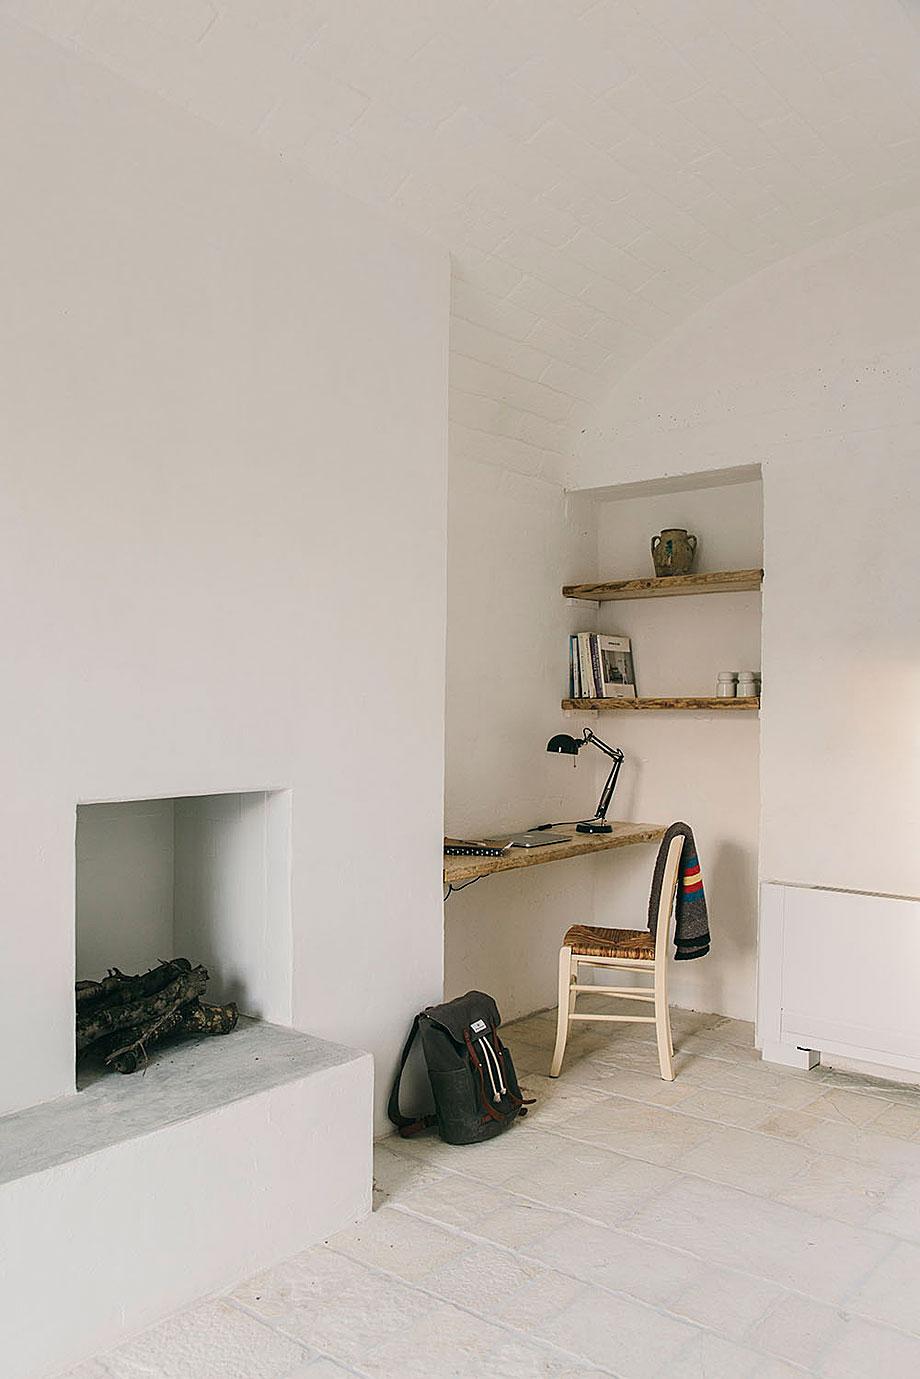 masseria-moroseta-andrew-trotter-architecture-puglia-ostuni-openhouse-17